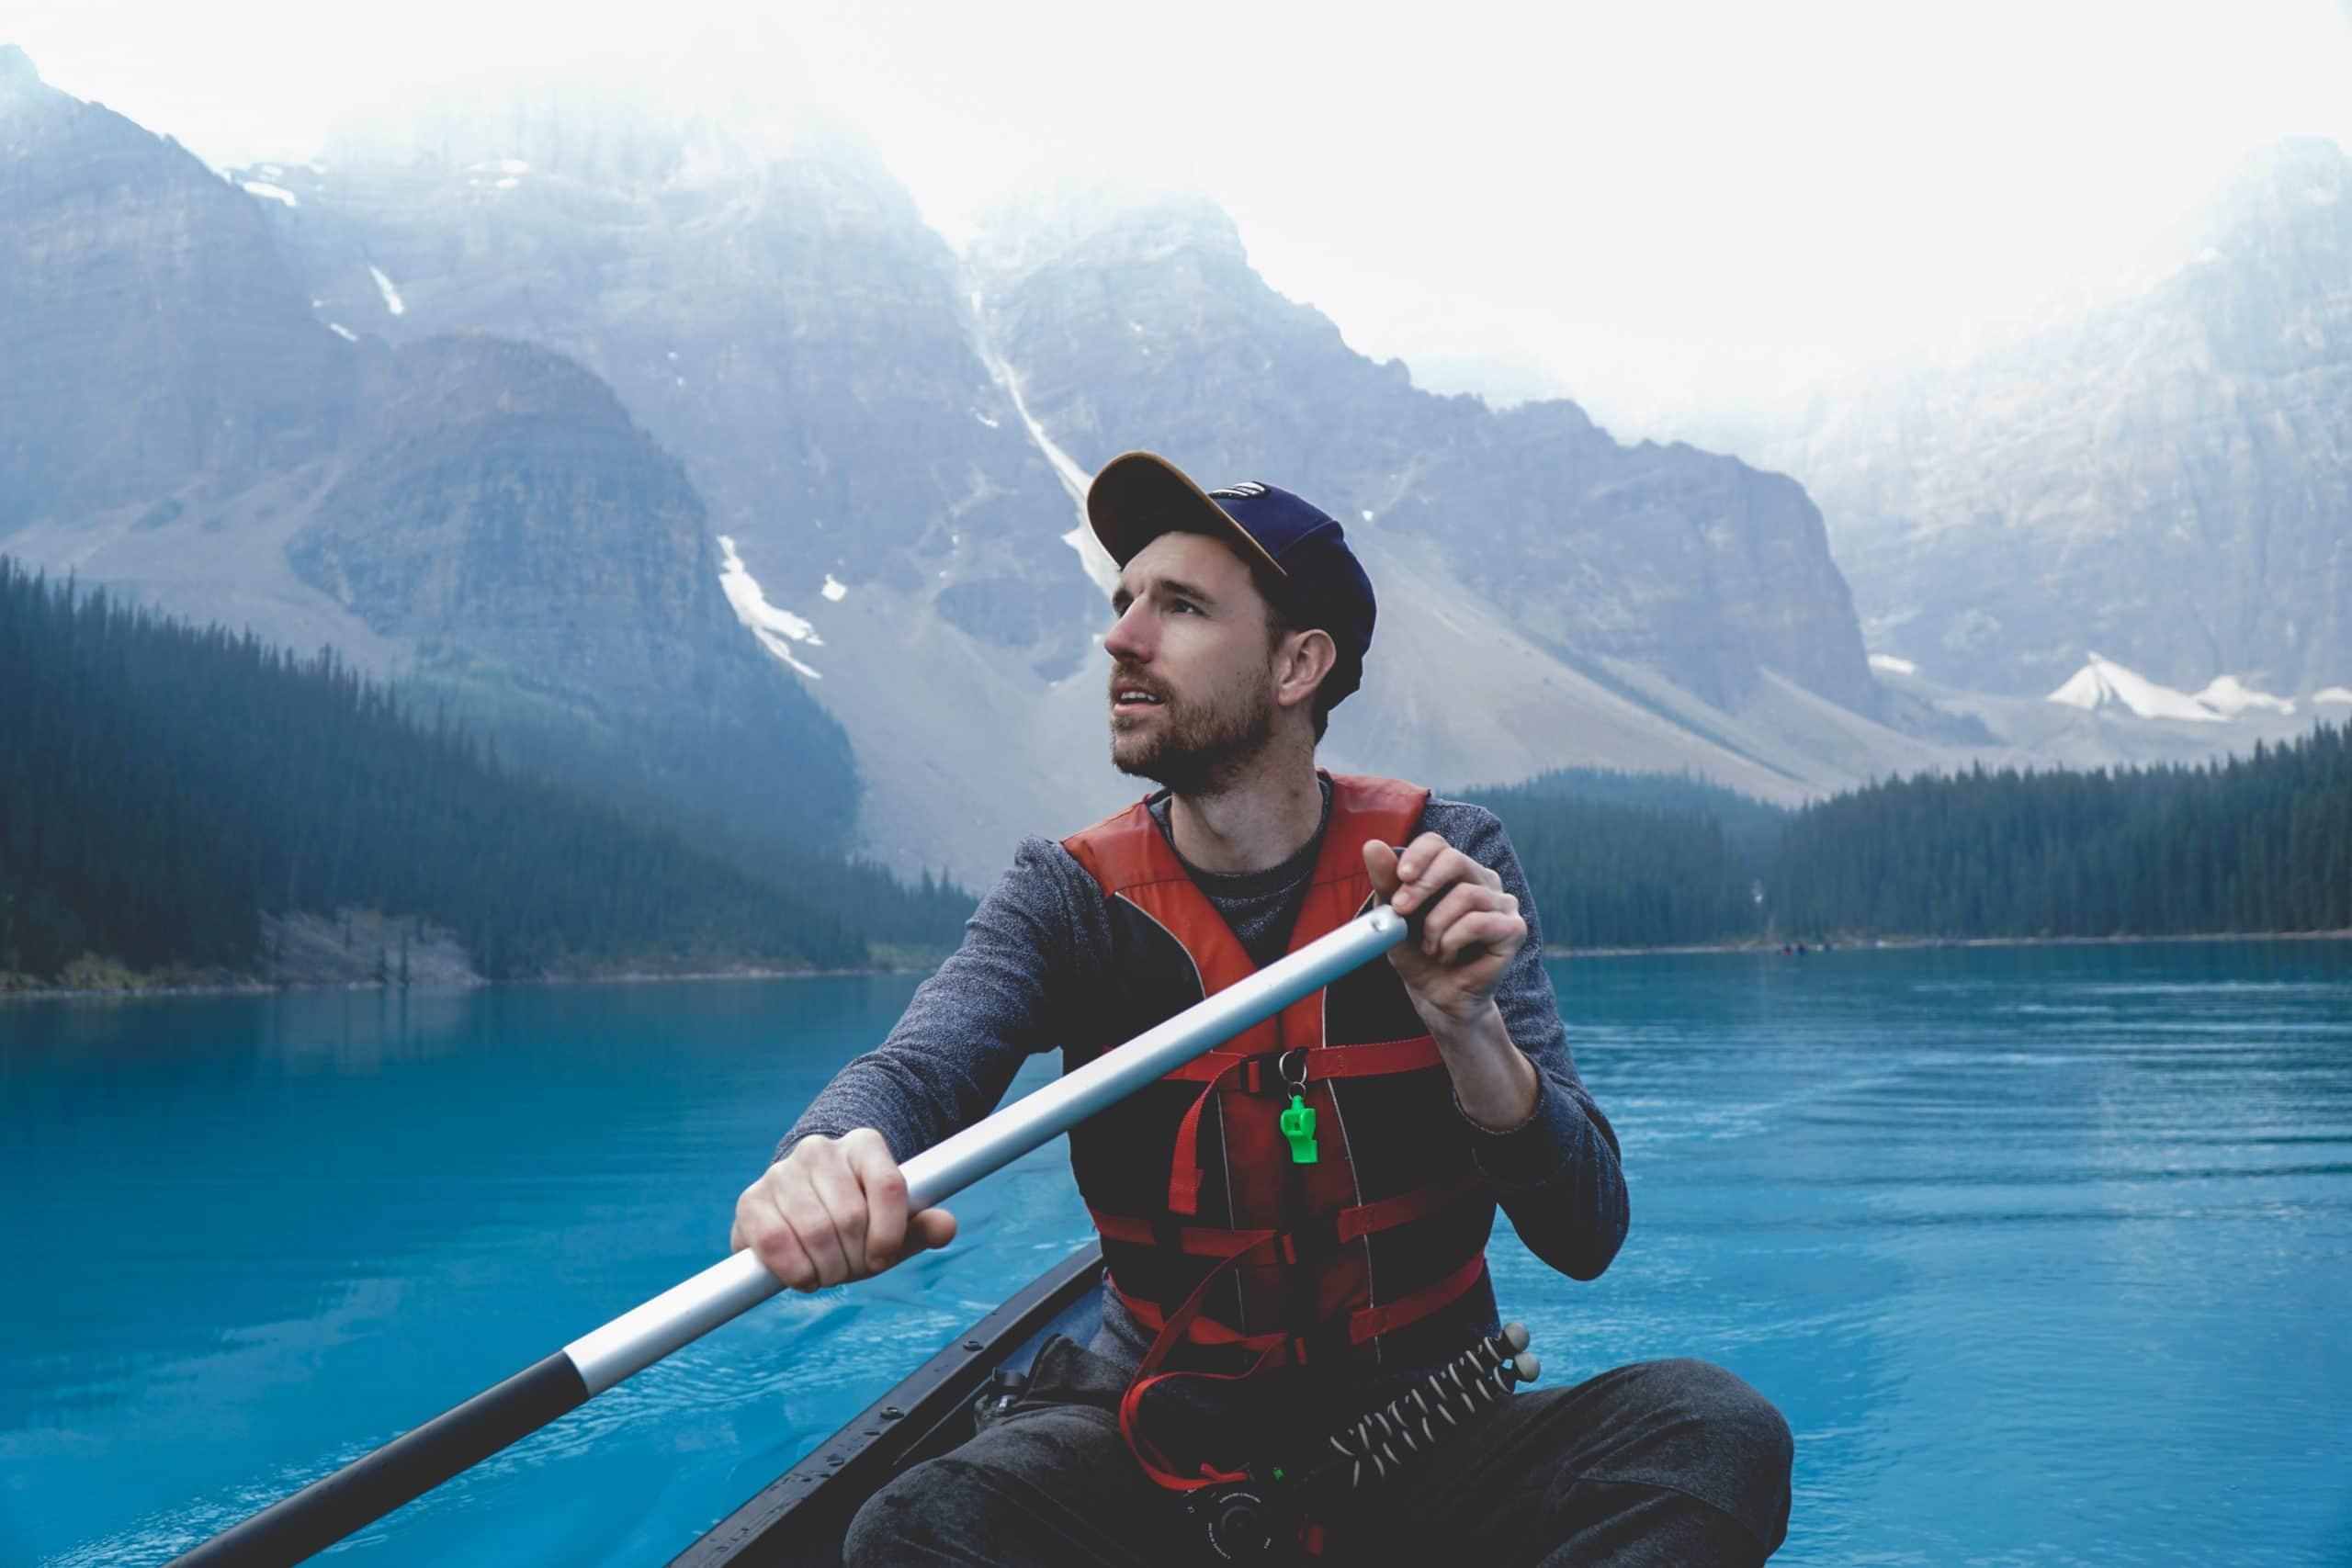 Kyle Taggart kayaking